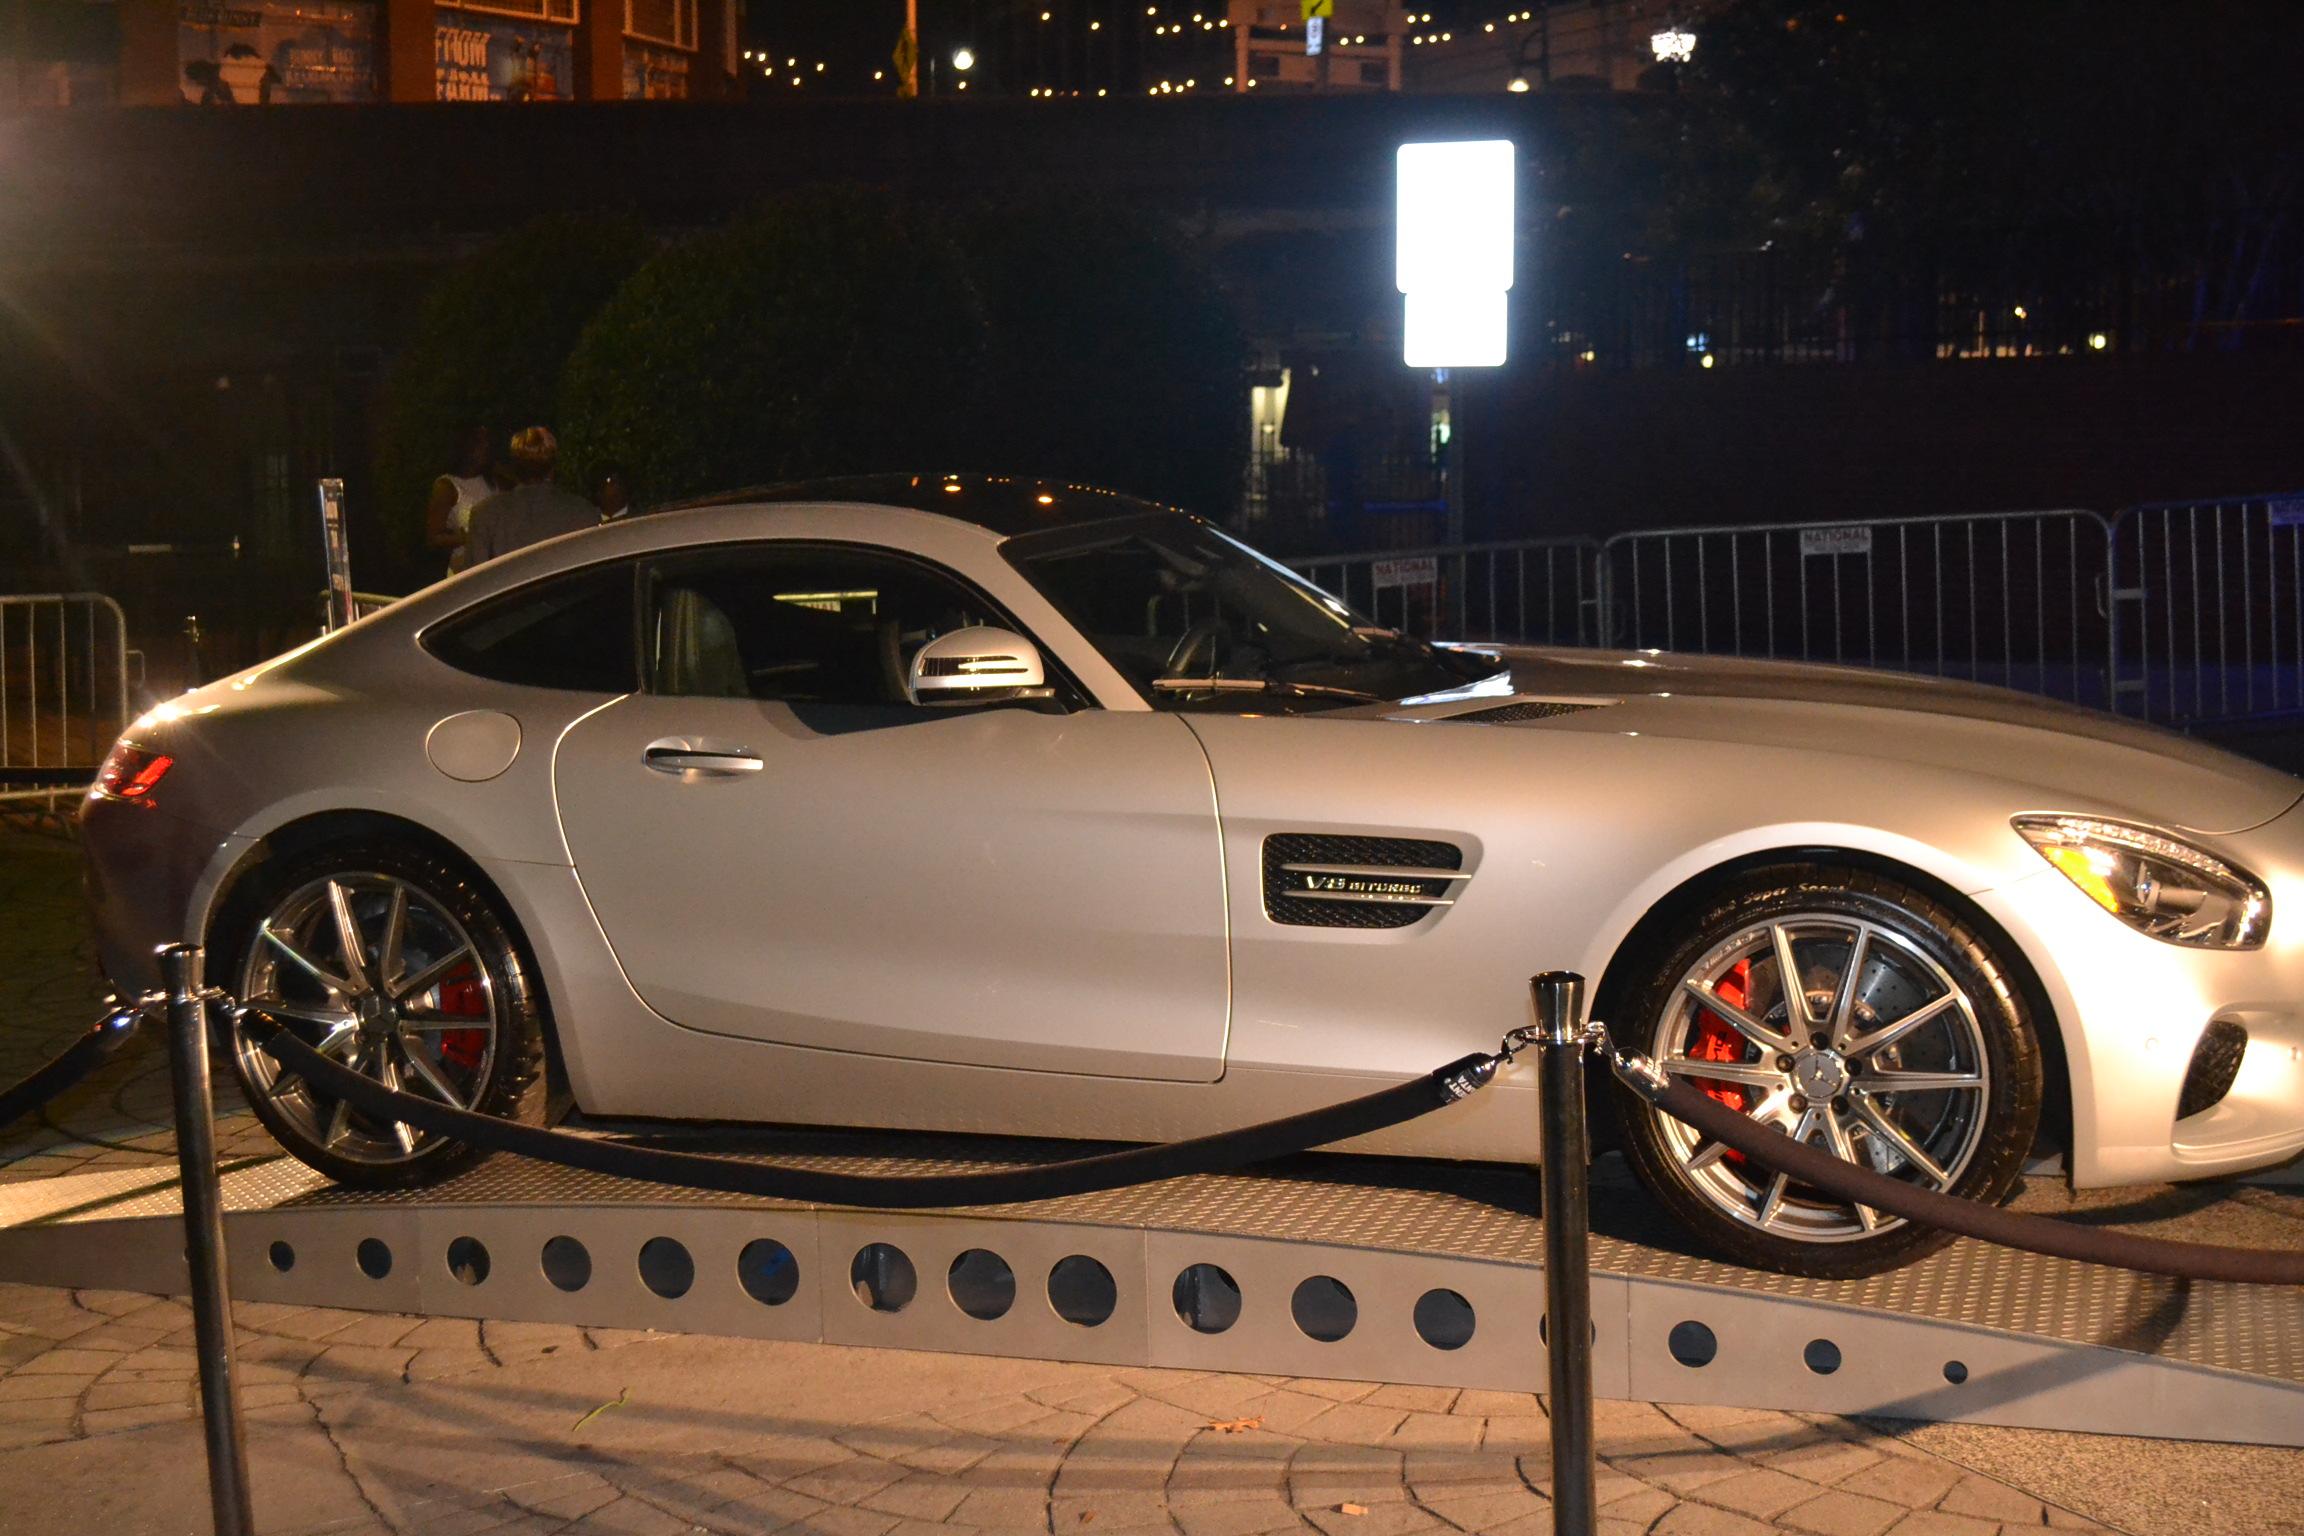 Mercedes benz evolution tour atlanta 2015 naturalbabydol for Mercedes benz plant atlanta ga